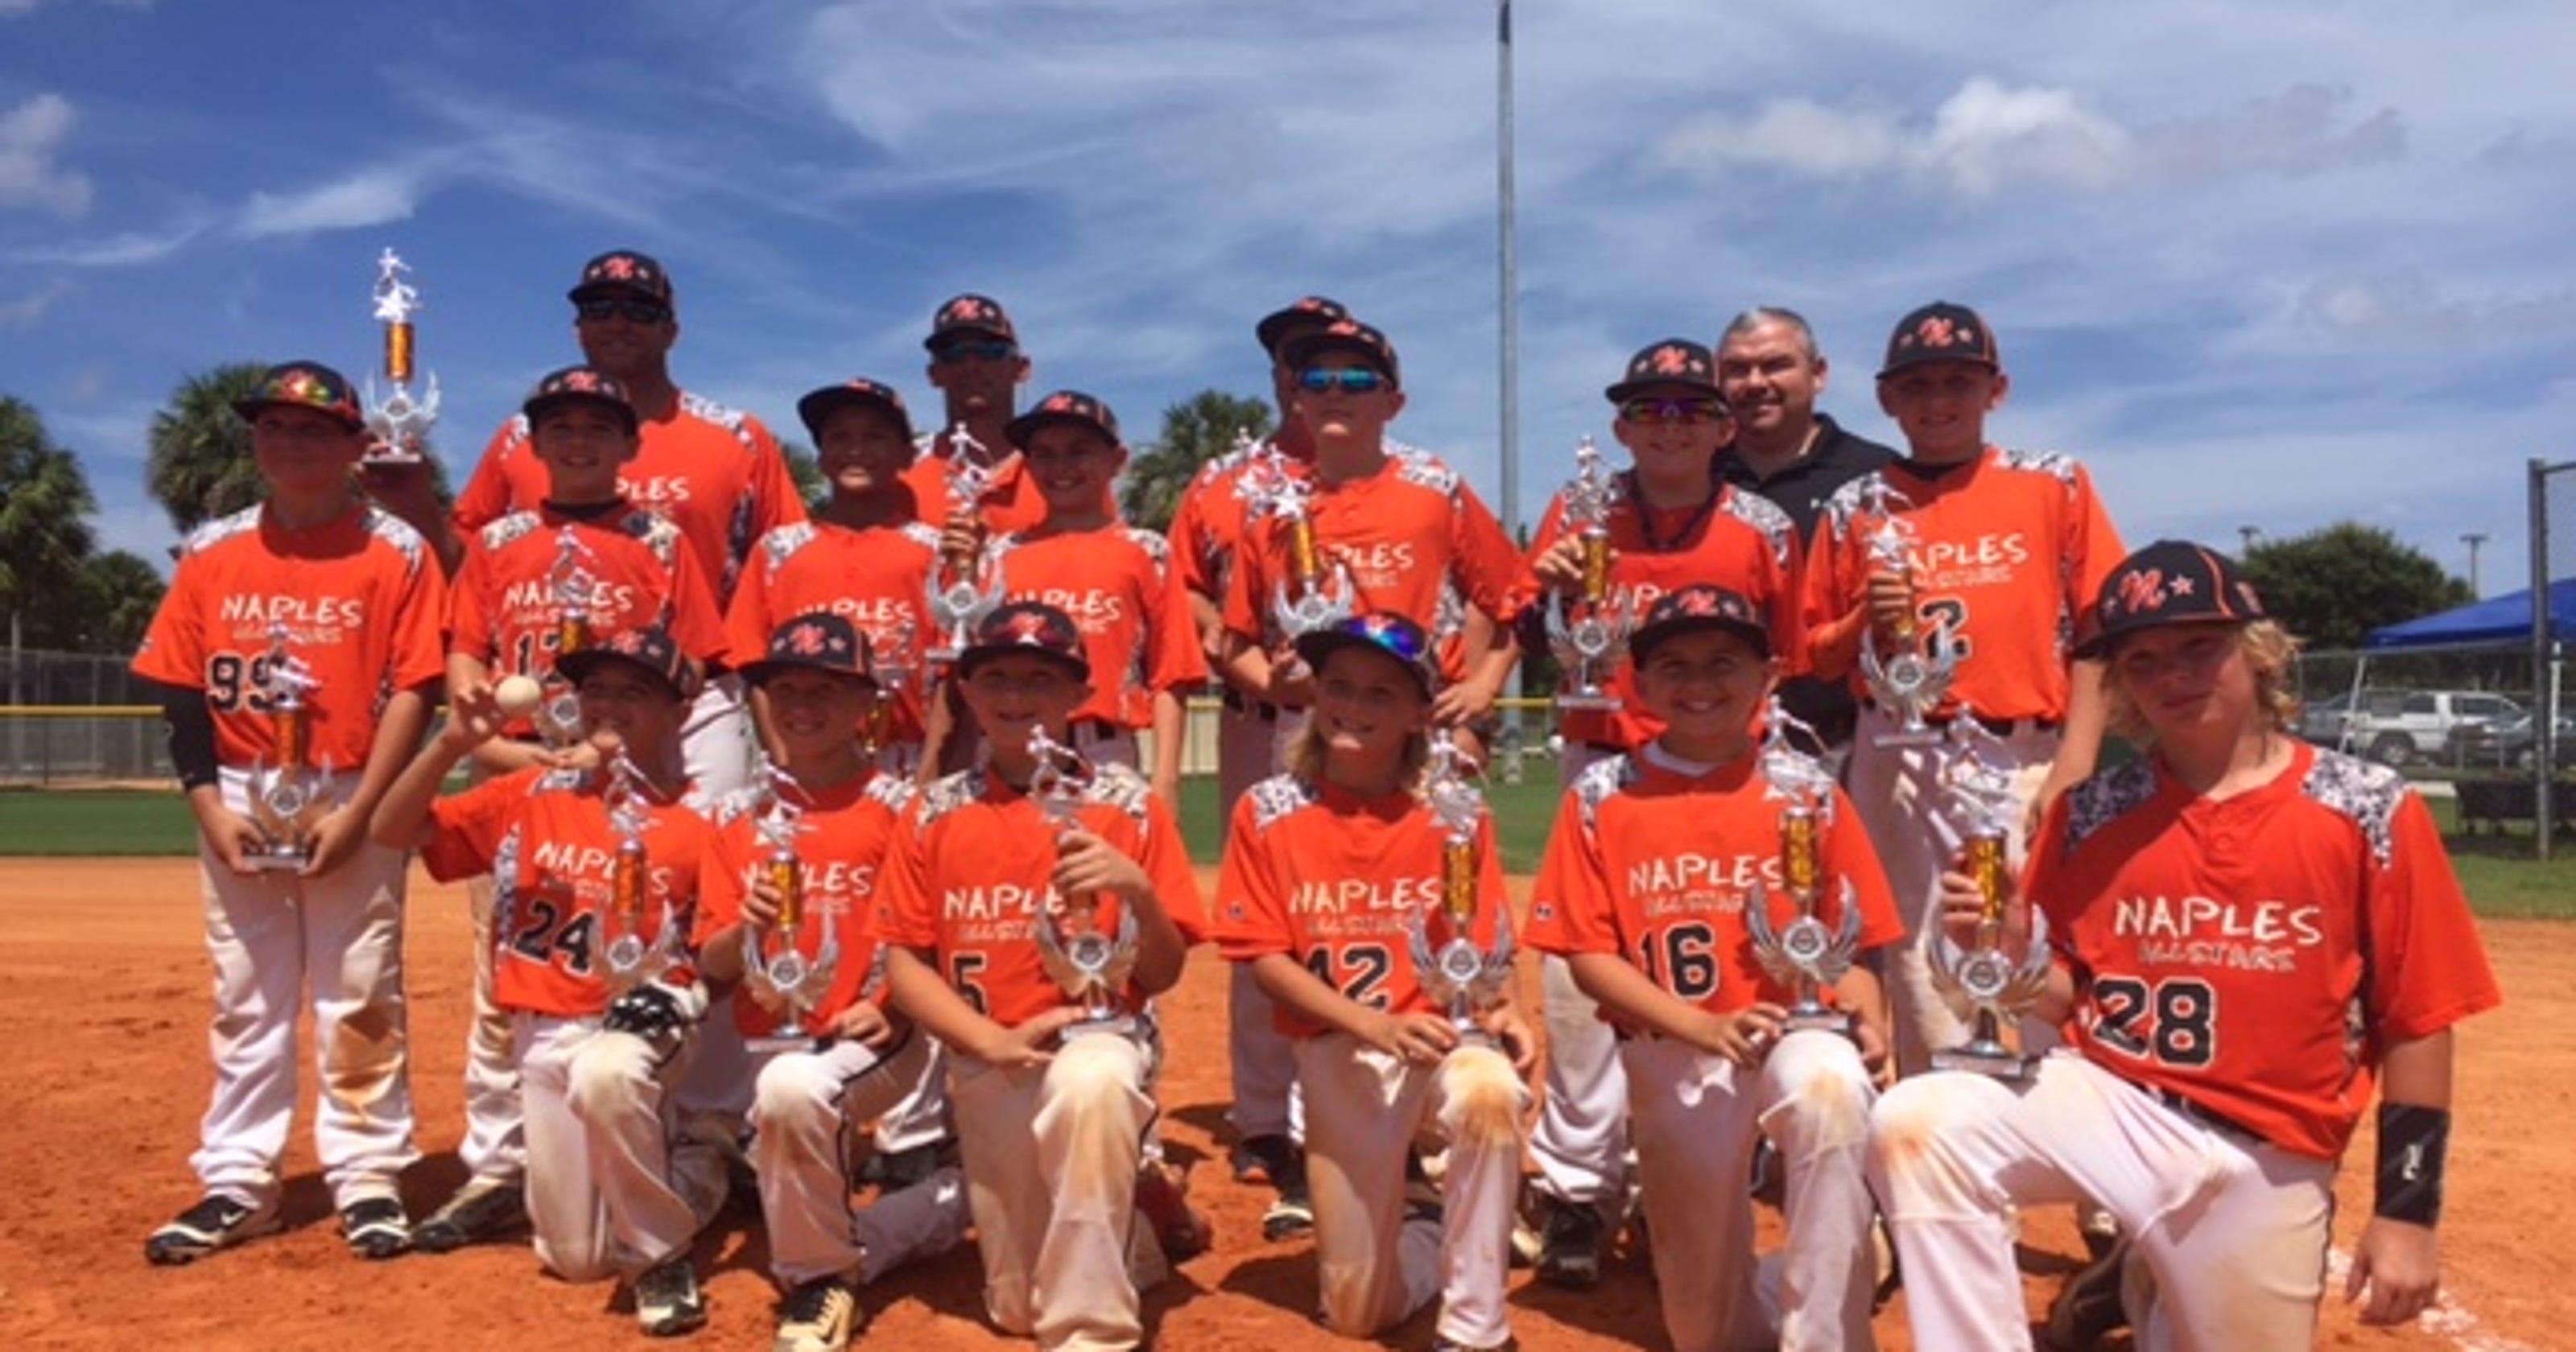 Naples Cal Ripken 11u Takes Second in State Tournament